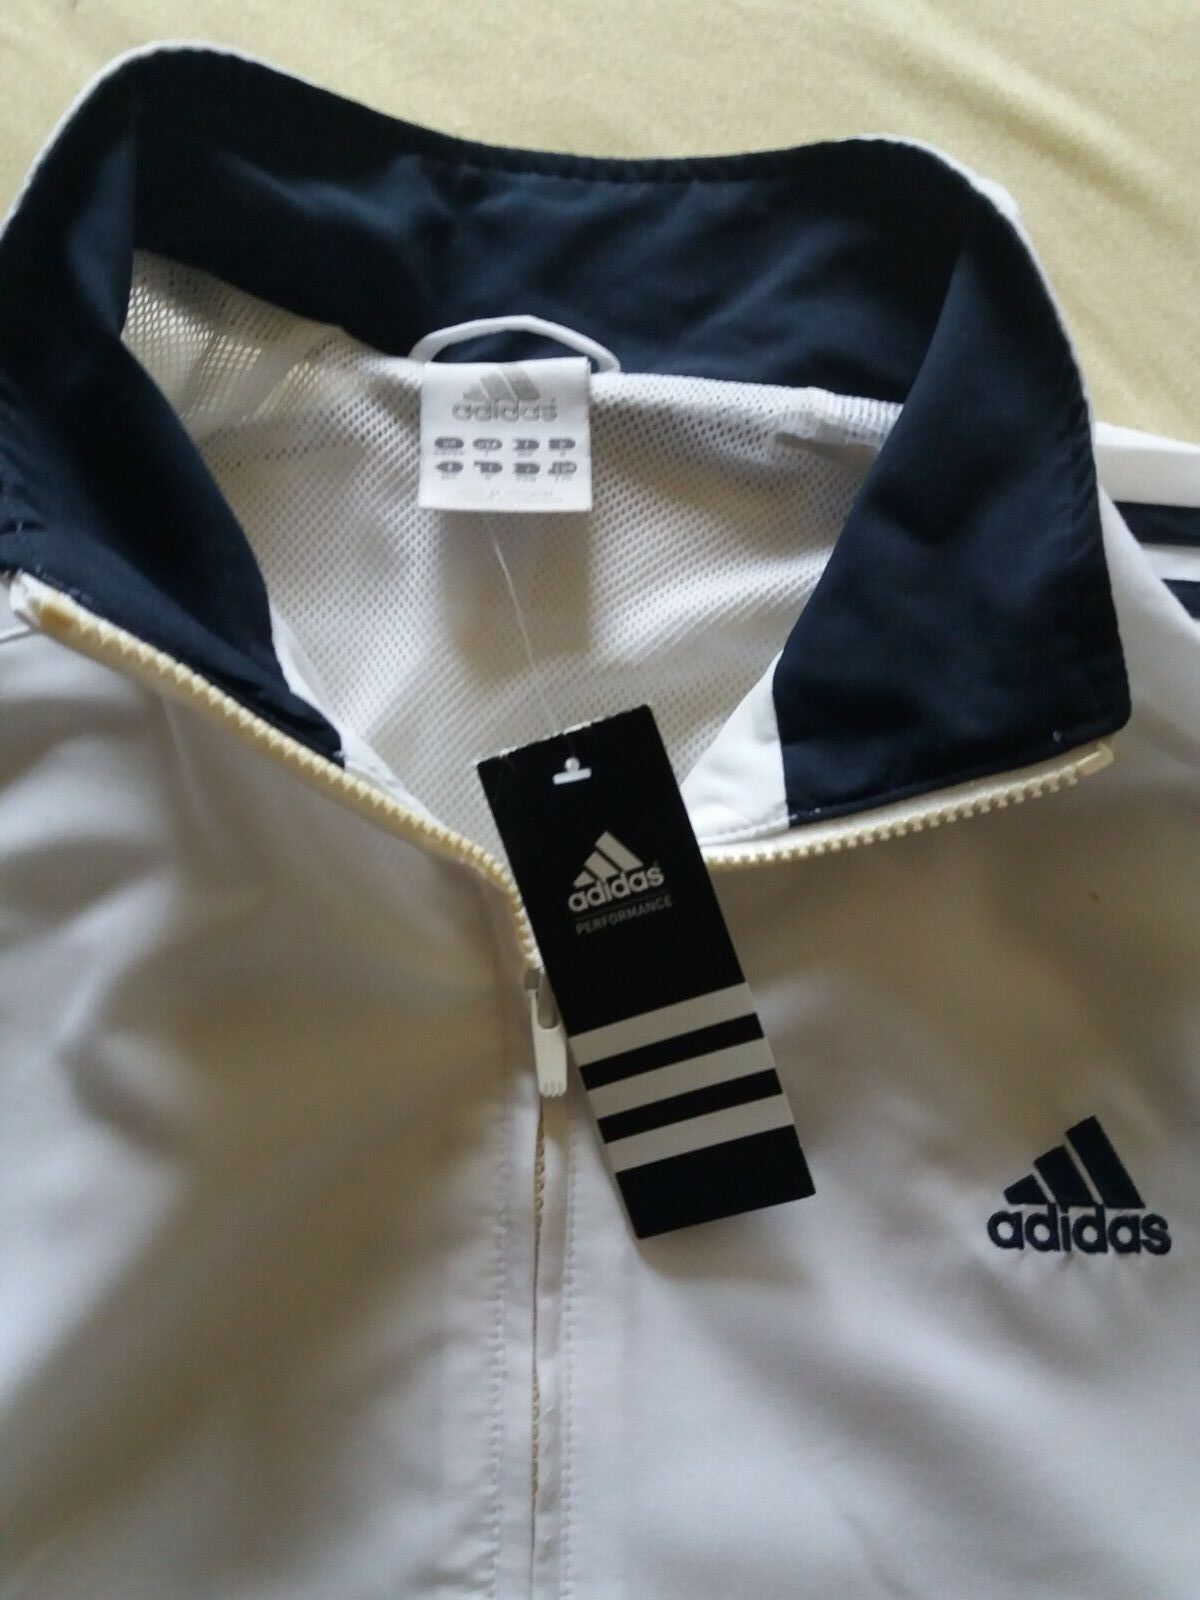 ADIDAS 8 Trainingsjacke schwarz weiß Größe 8 ADIDAS neu e00b94